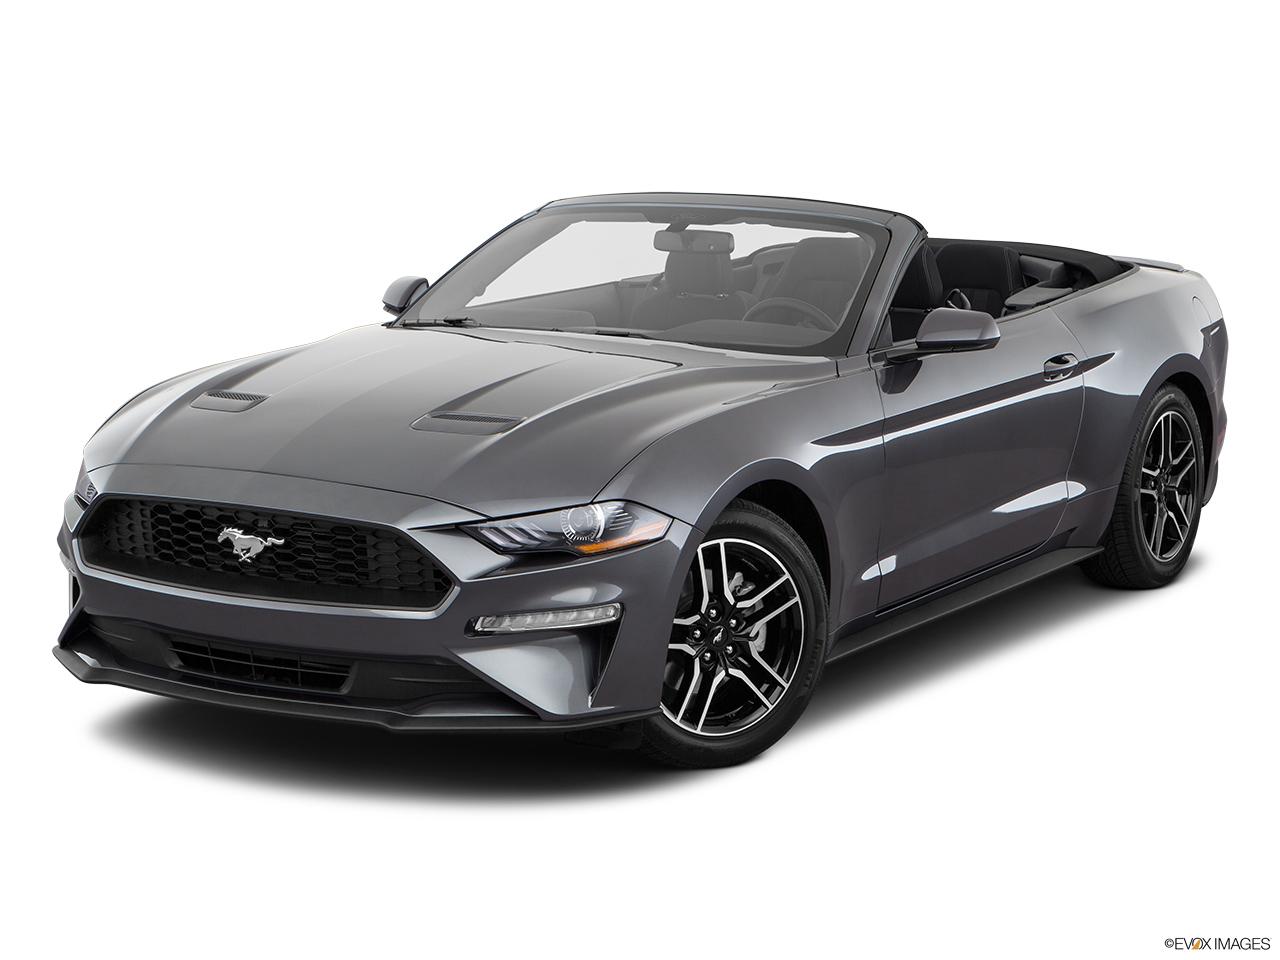 Ford Mustang 2018, Saudi Arabia, Front angle view.